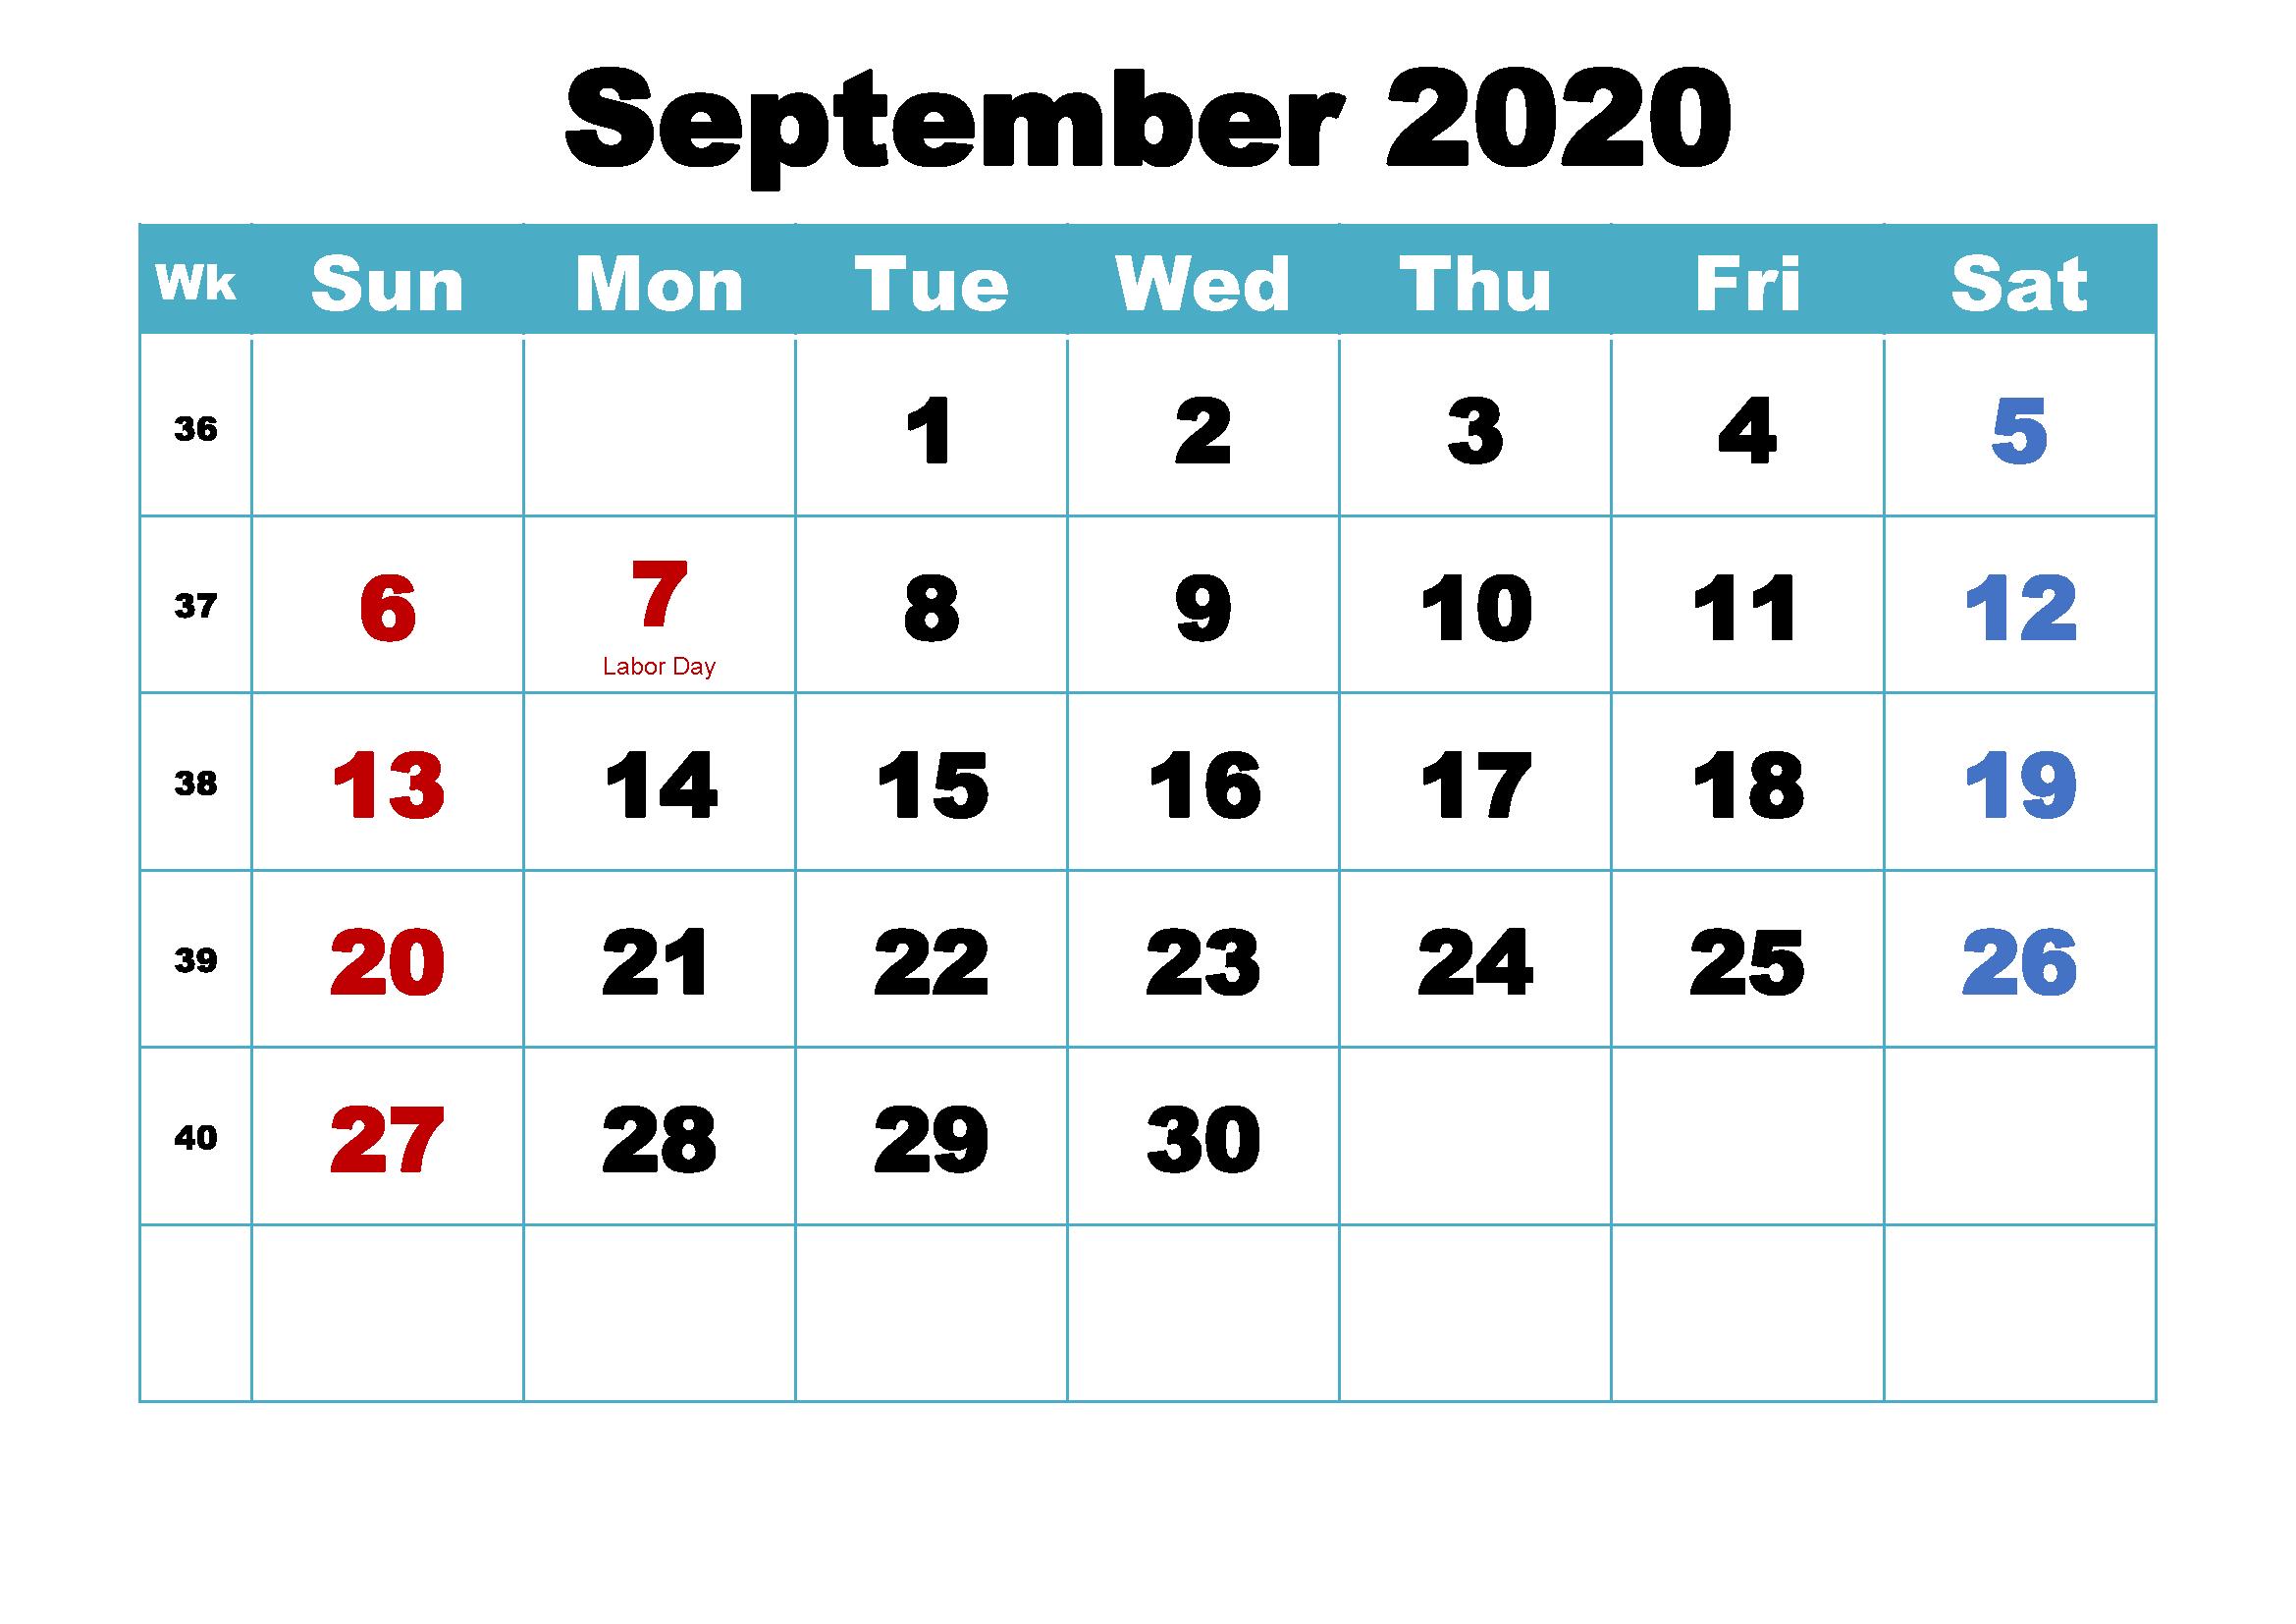 September 2020 Calendar